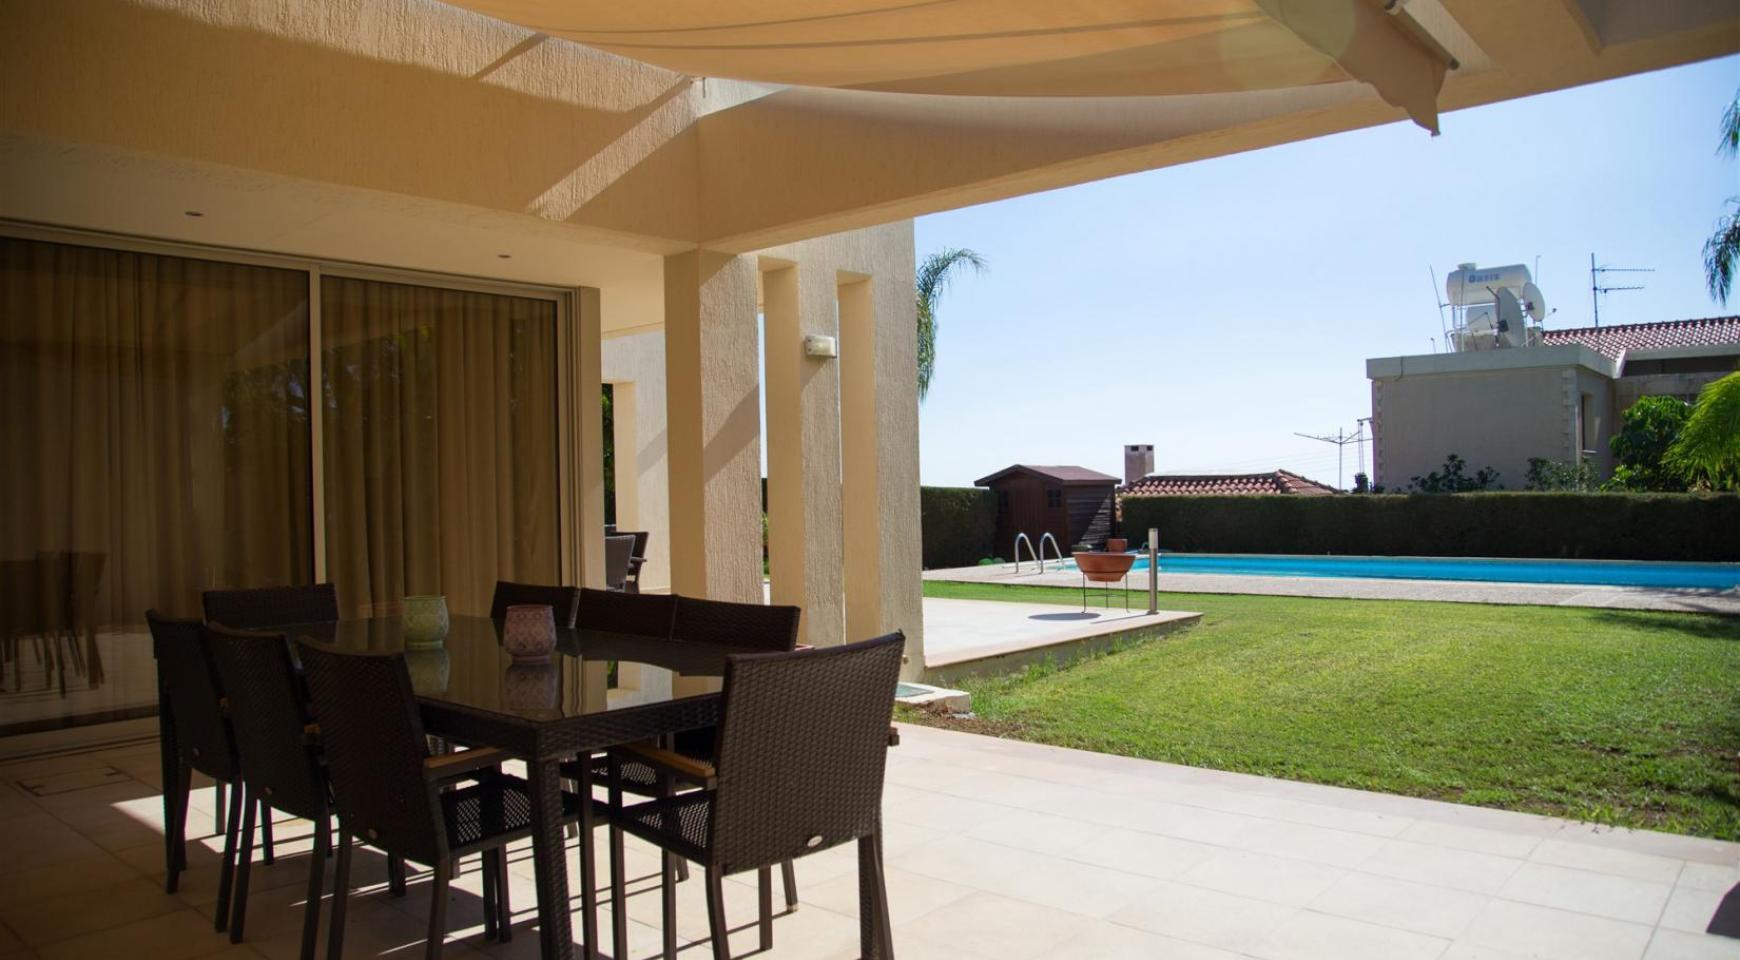 Modern Luxury 4 Bedroom Villa in Sfalagiotisa, Agios Athanasios - 11